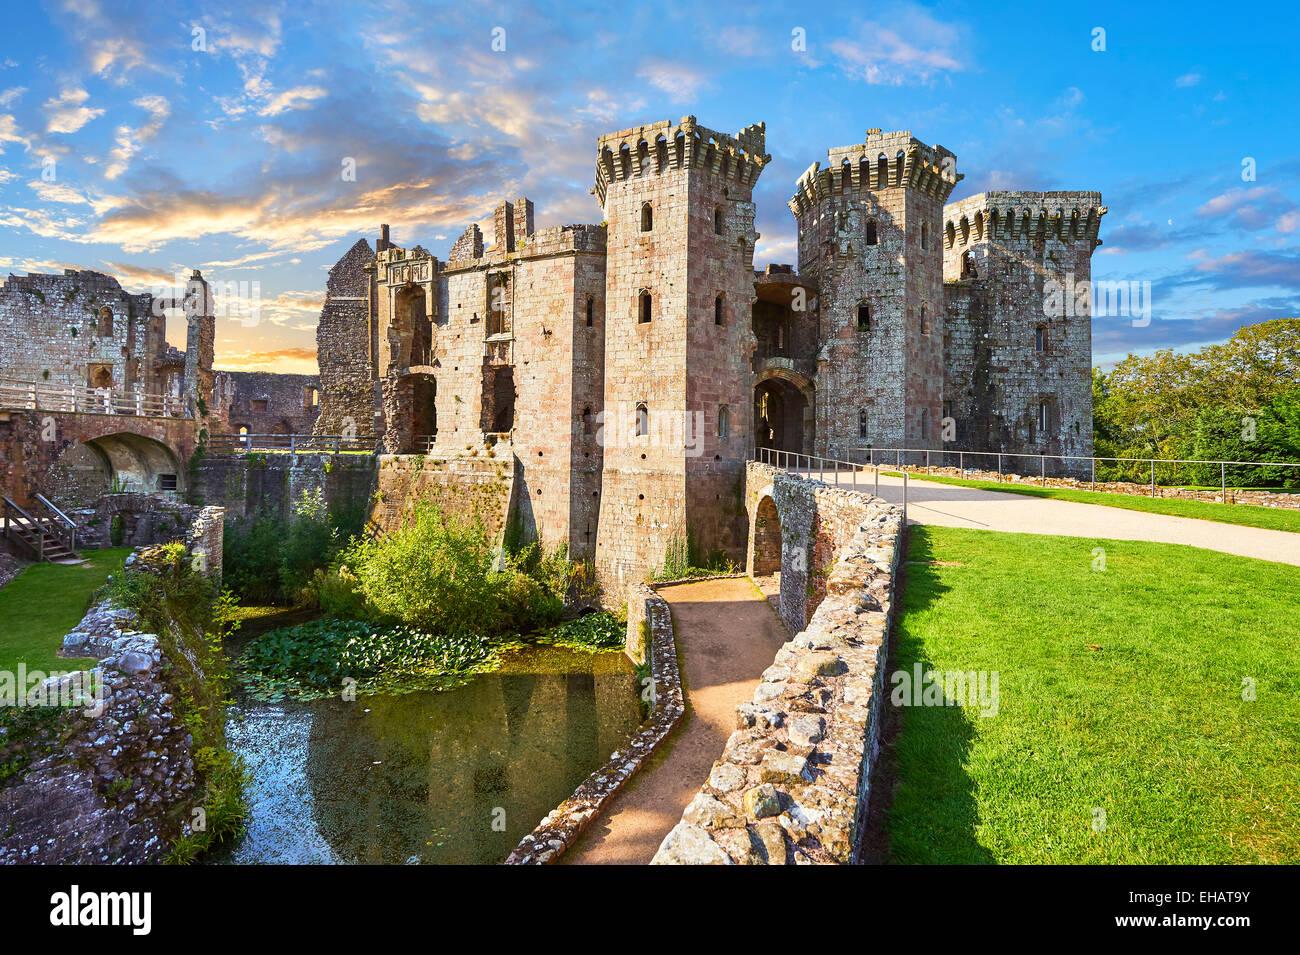 Ruins of the medieval Raglan Castle (Welsh: Castell Rhaglan) Monmothshire, Wales. - Stock Image